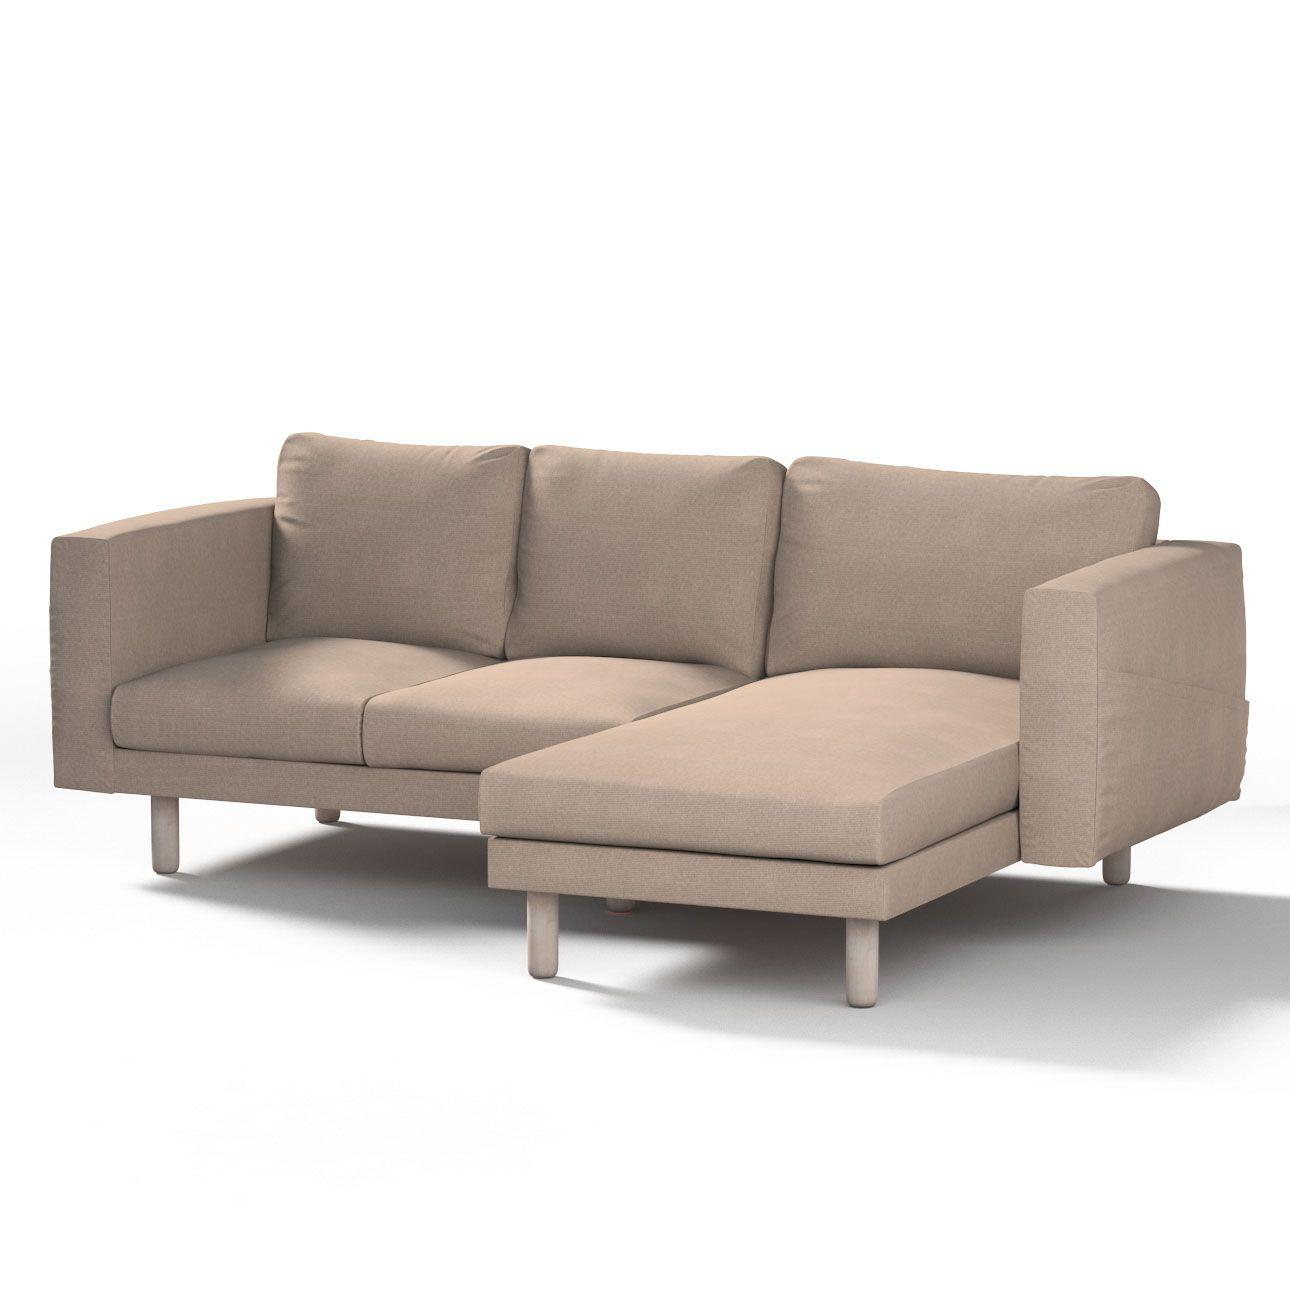 Full Size of Sofa Mit Recamiere Rechts Ikea Kivik 3er Ledersofa Oder Links Ecksofa Schlaffunktion Ektorp Bezug Und Relaxfunktion Braun Couch Bettfunktion P35231 Fenster Sofa Sofa Mit Recamiere